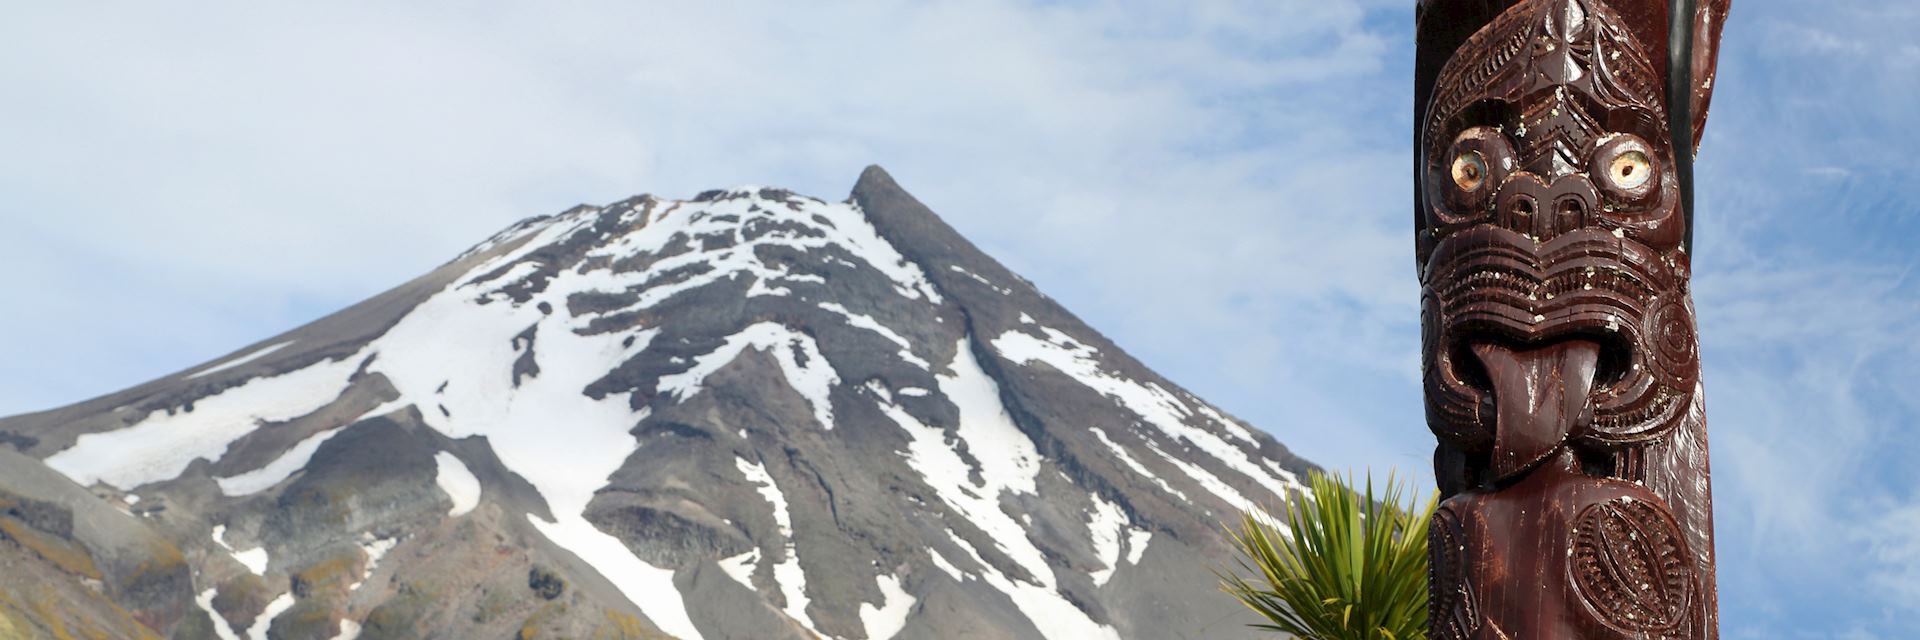 Maori carving against Volcano Taranaki